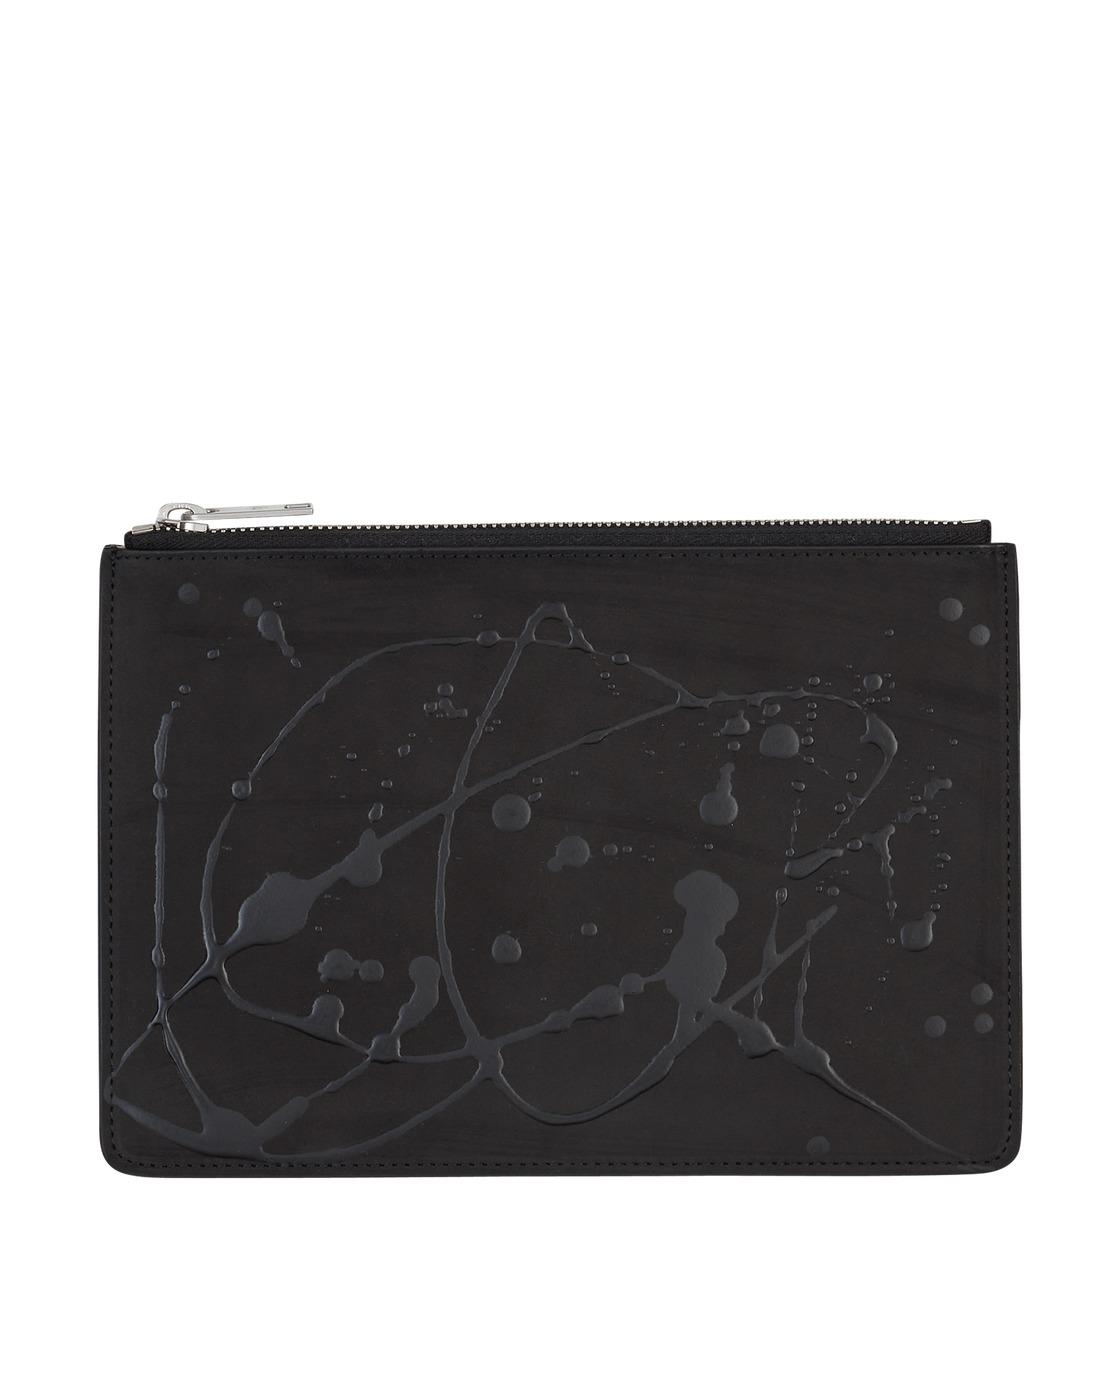 Photo: Maison Margiela Logo Wallet Black/Paint